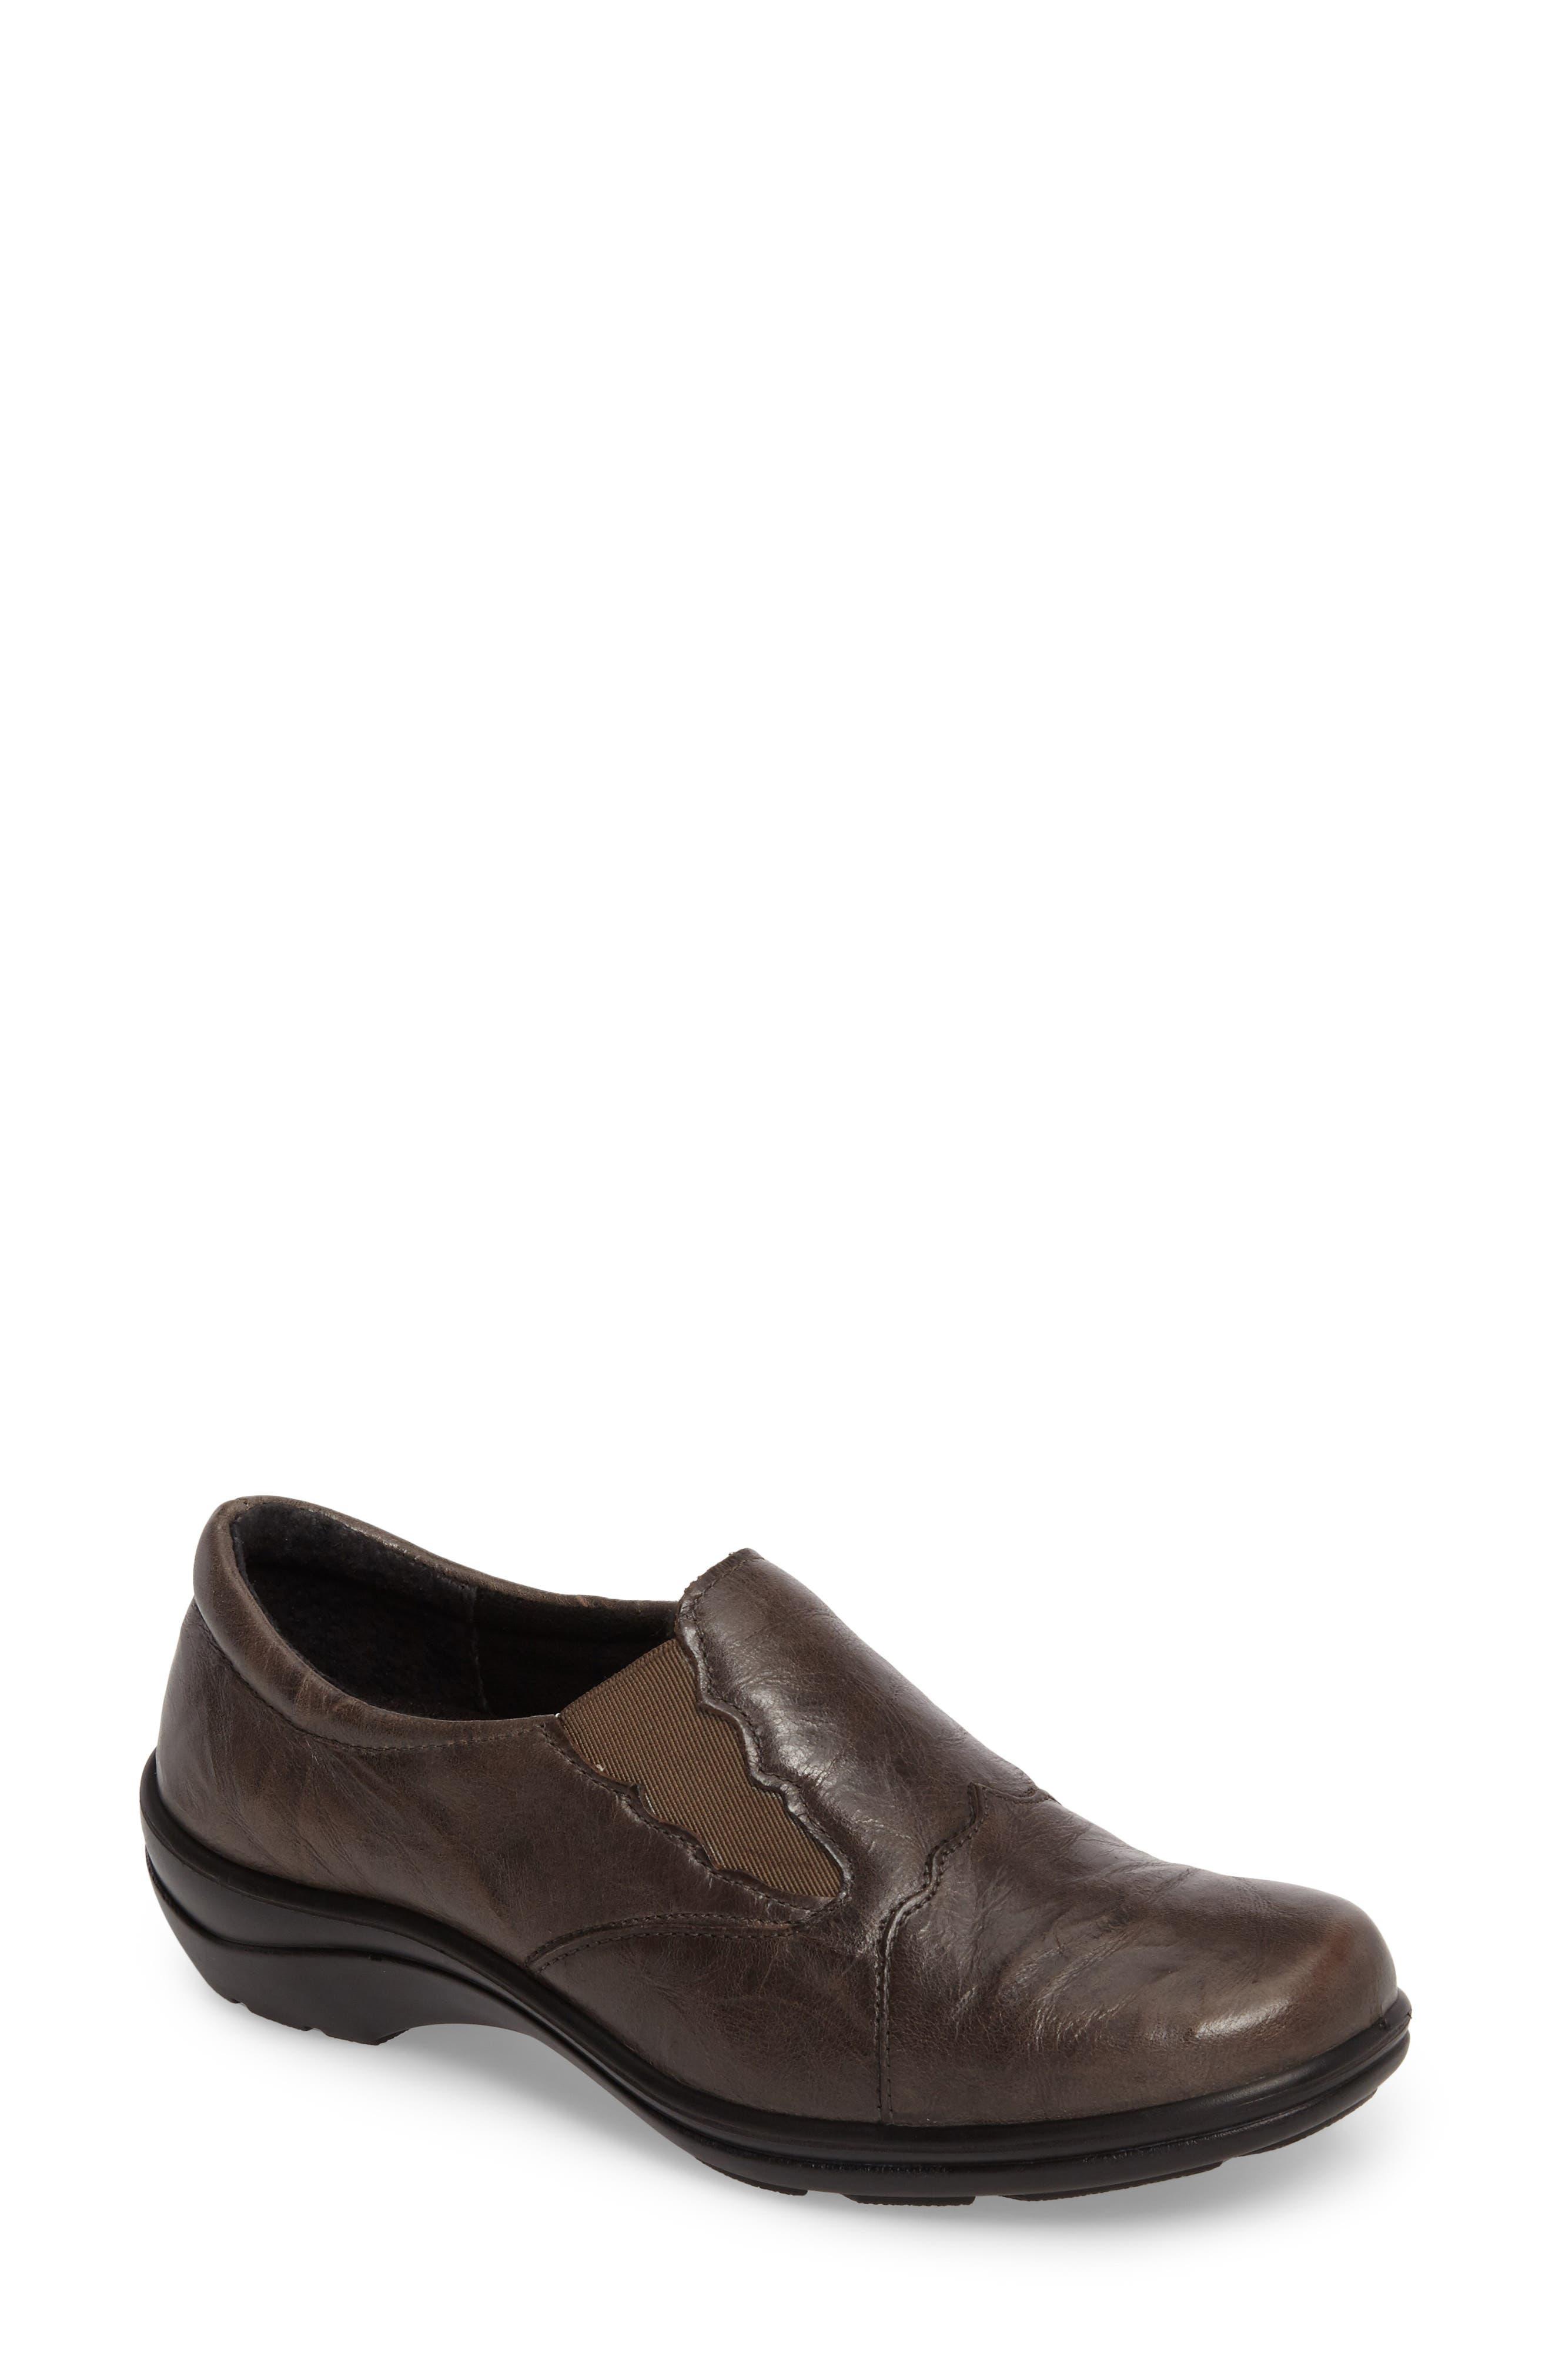 'Cassie 24' Flat,                             Main thumbnail 1, color,                             Graphite Leather